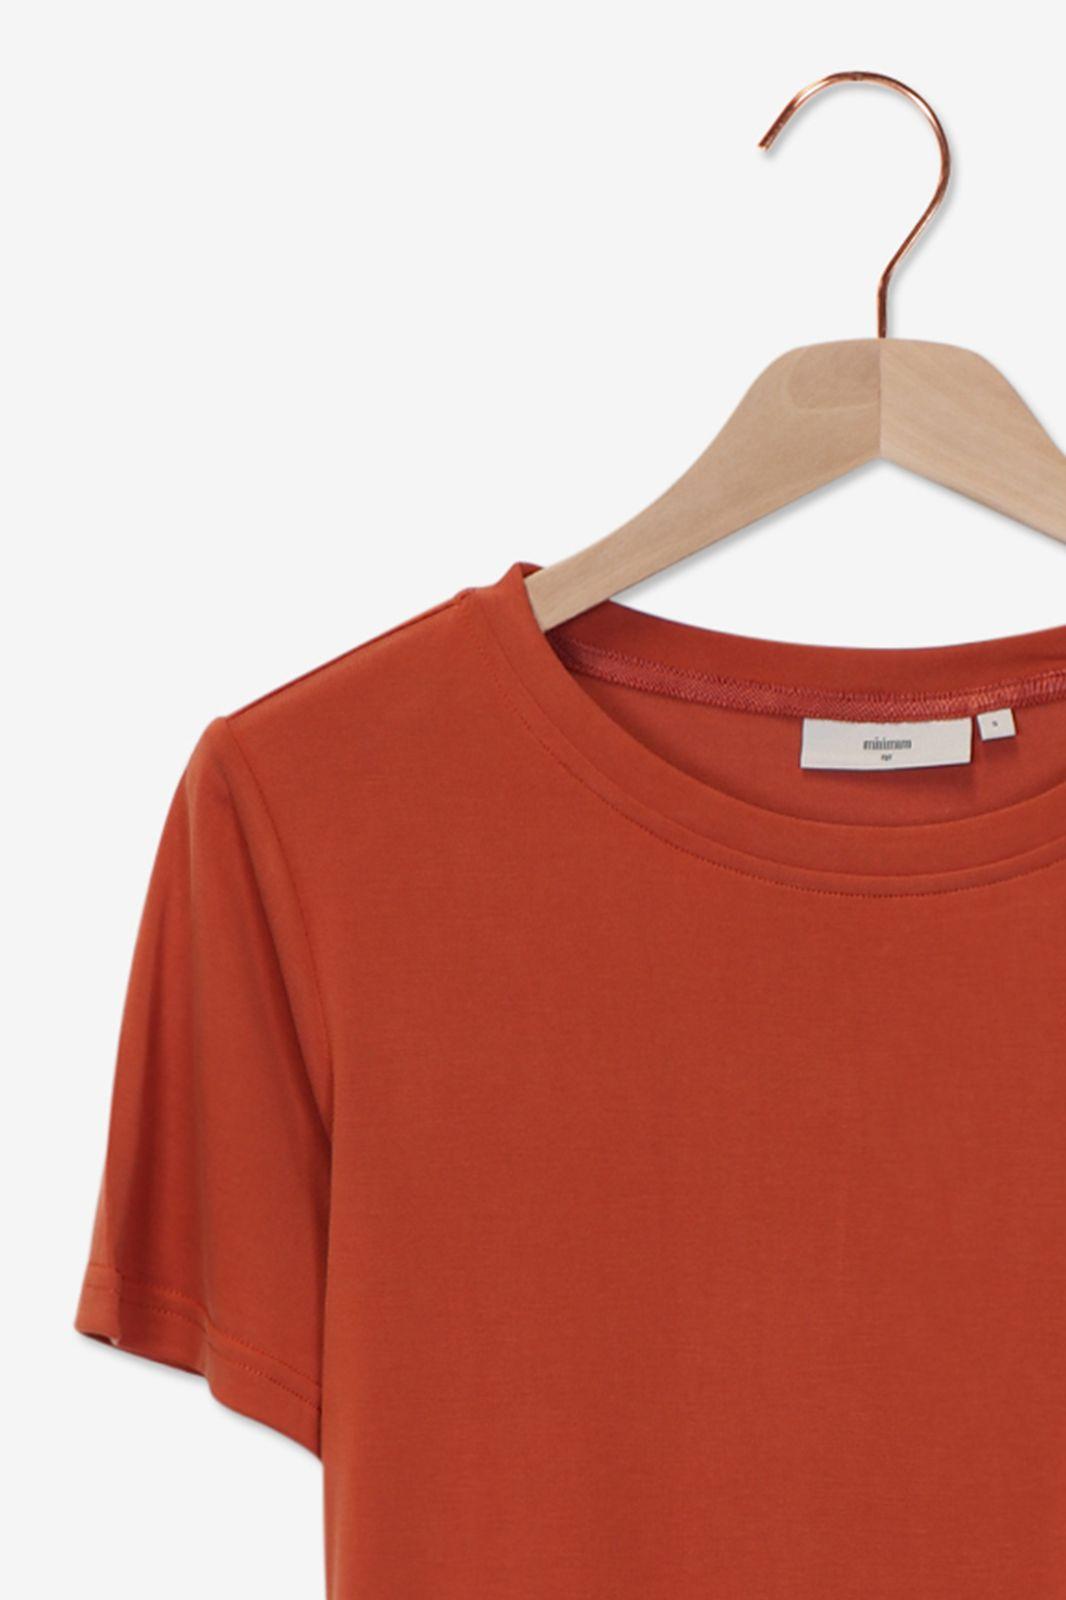 Minimum rood t-shirt